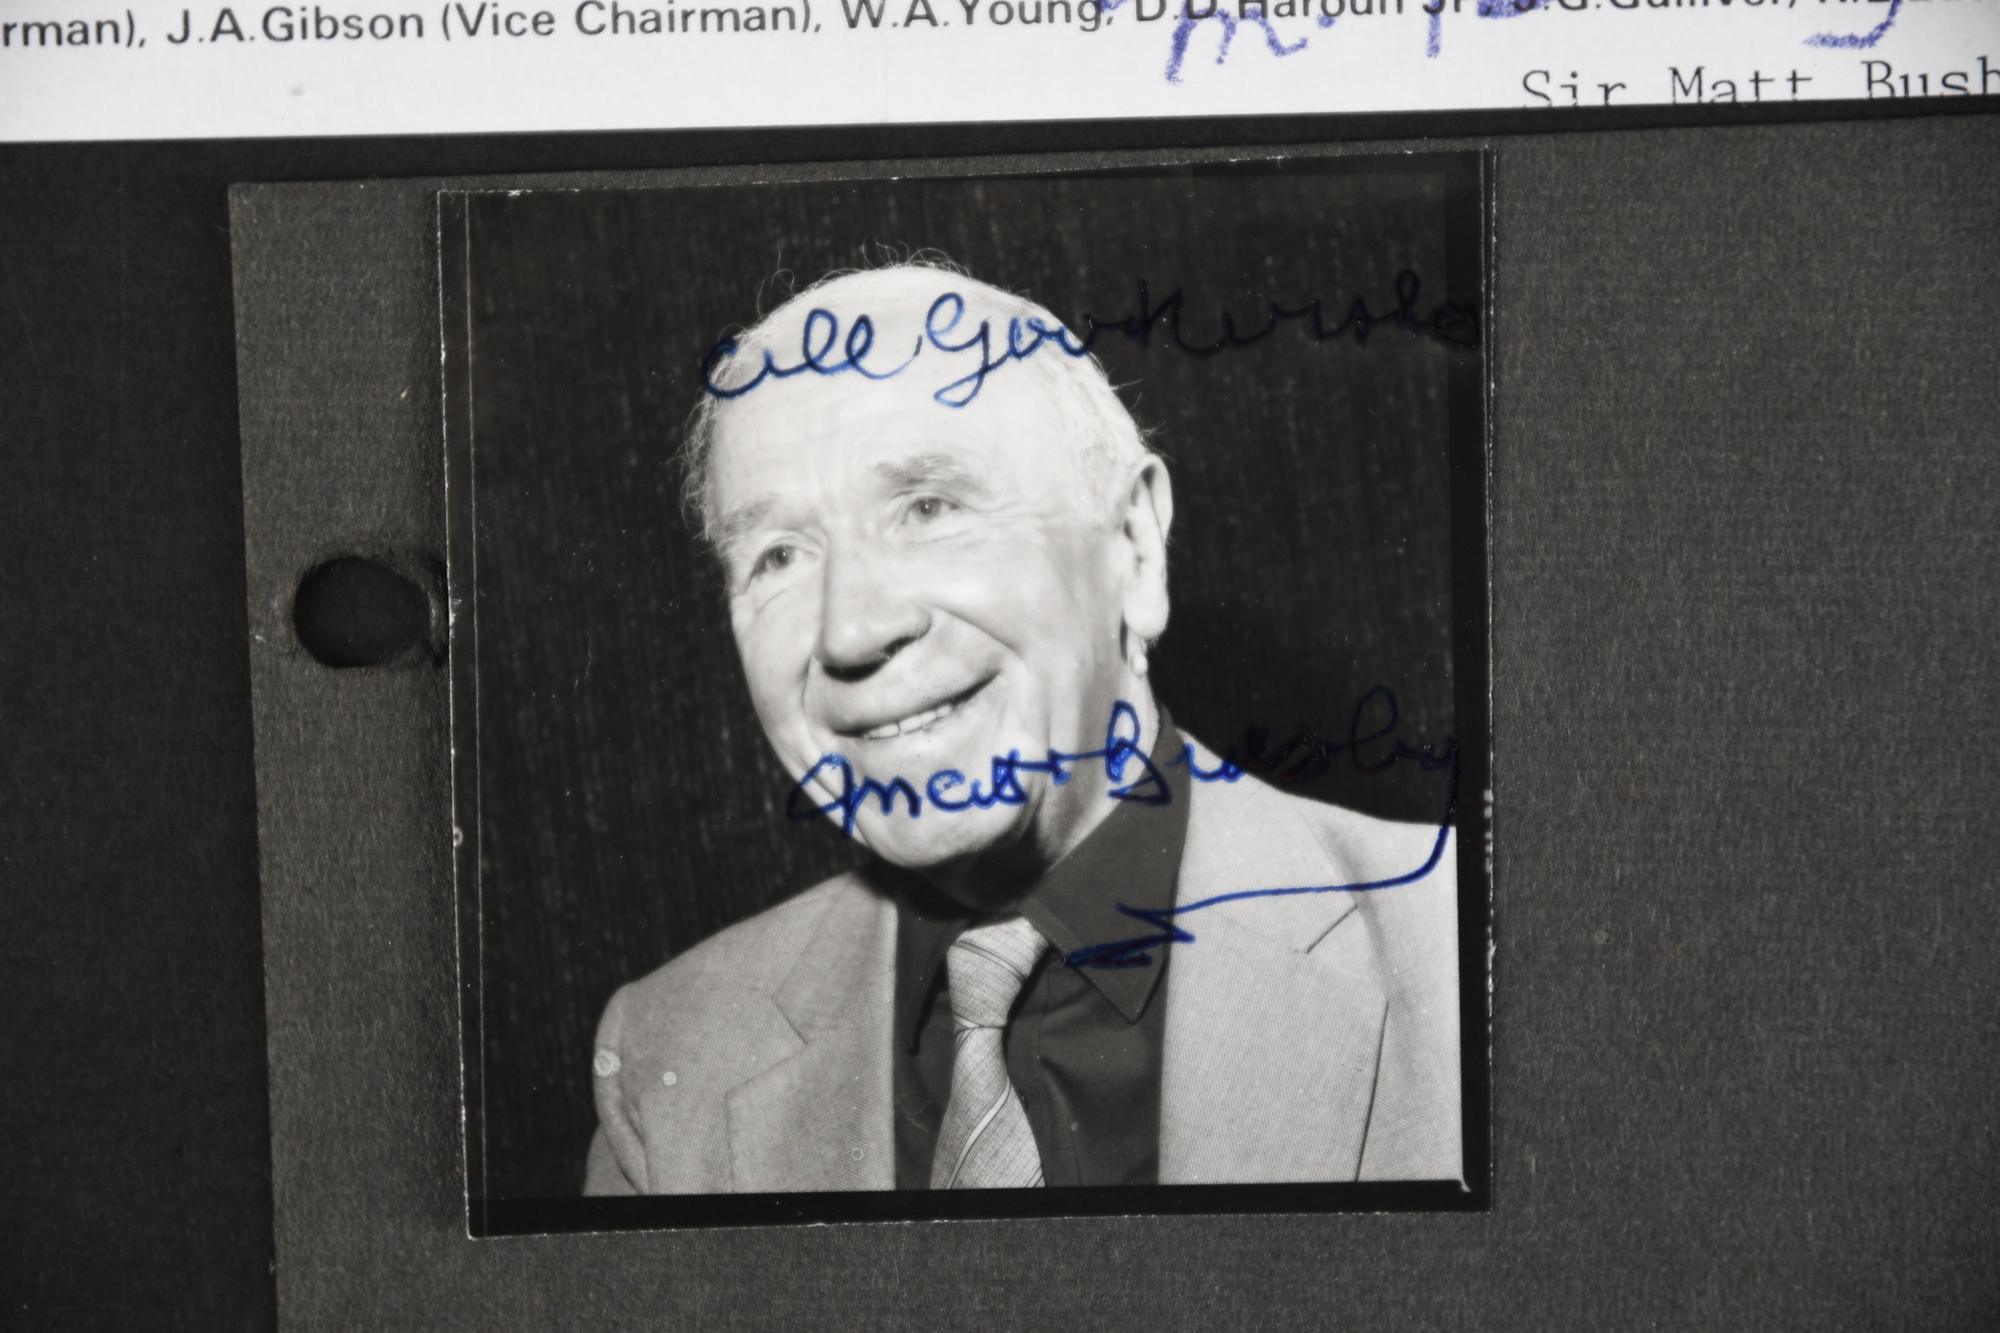 MATT BUSBY Original signature - Image 3 of 3